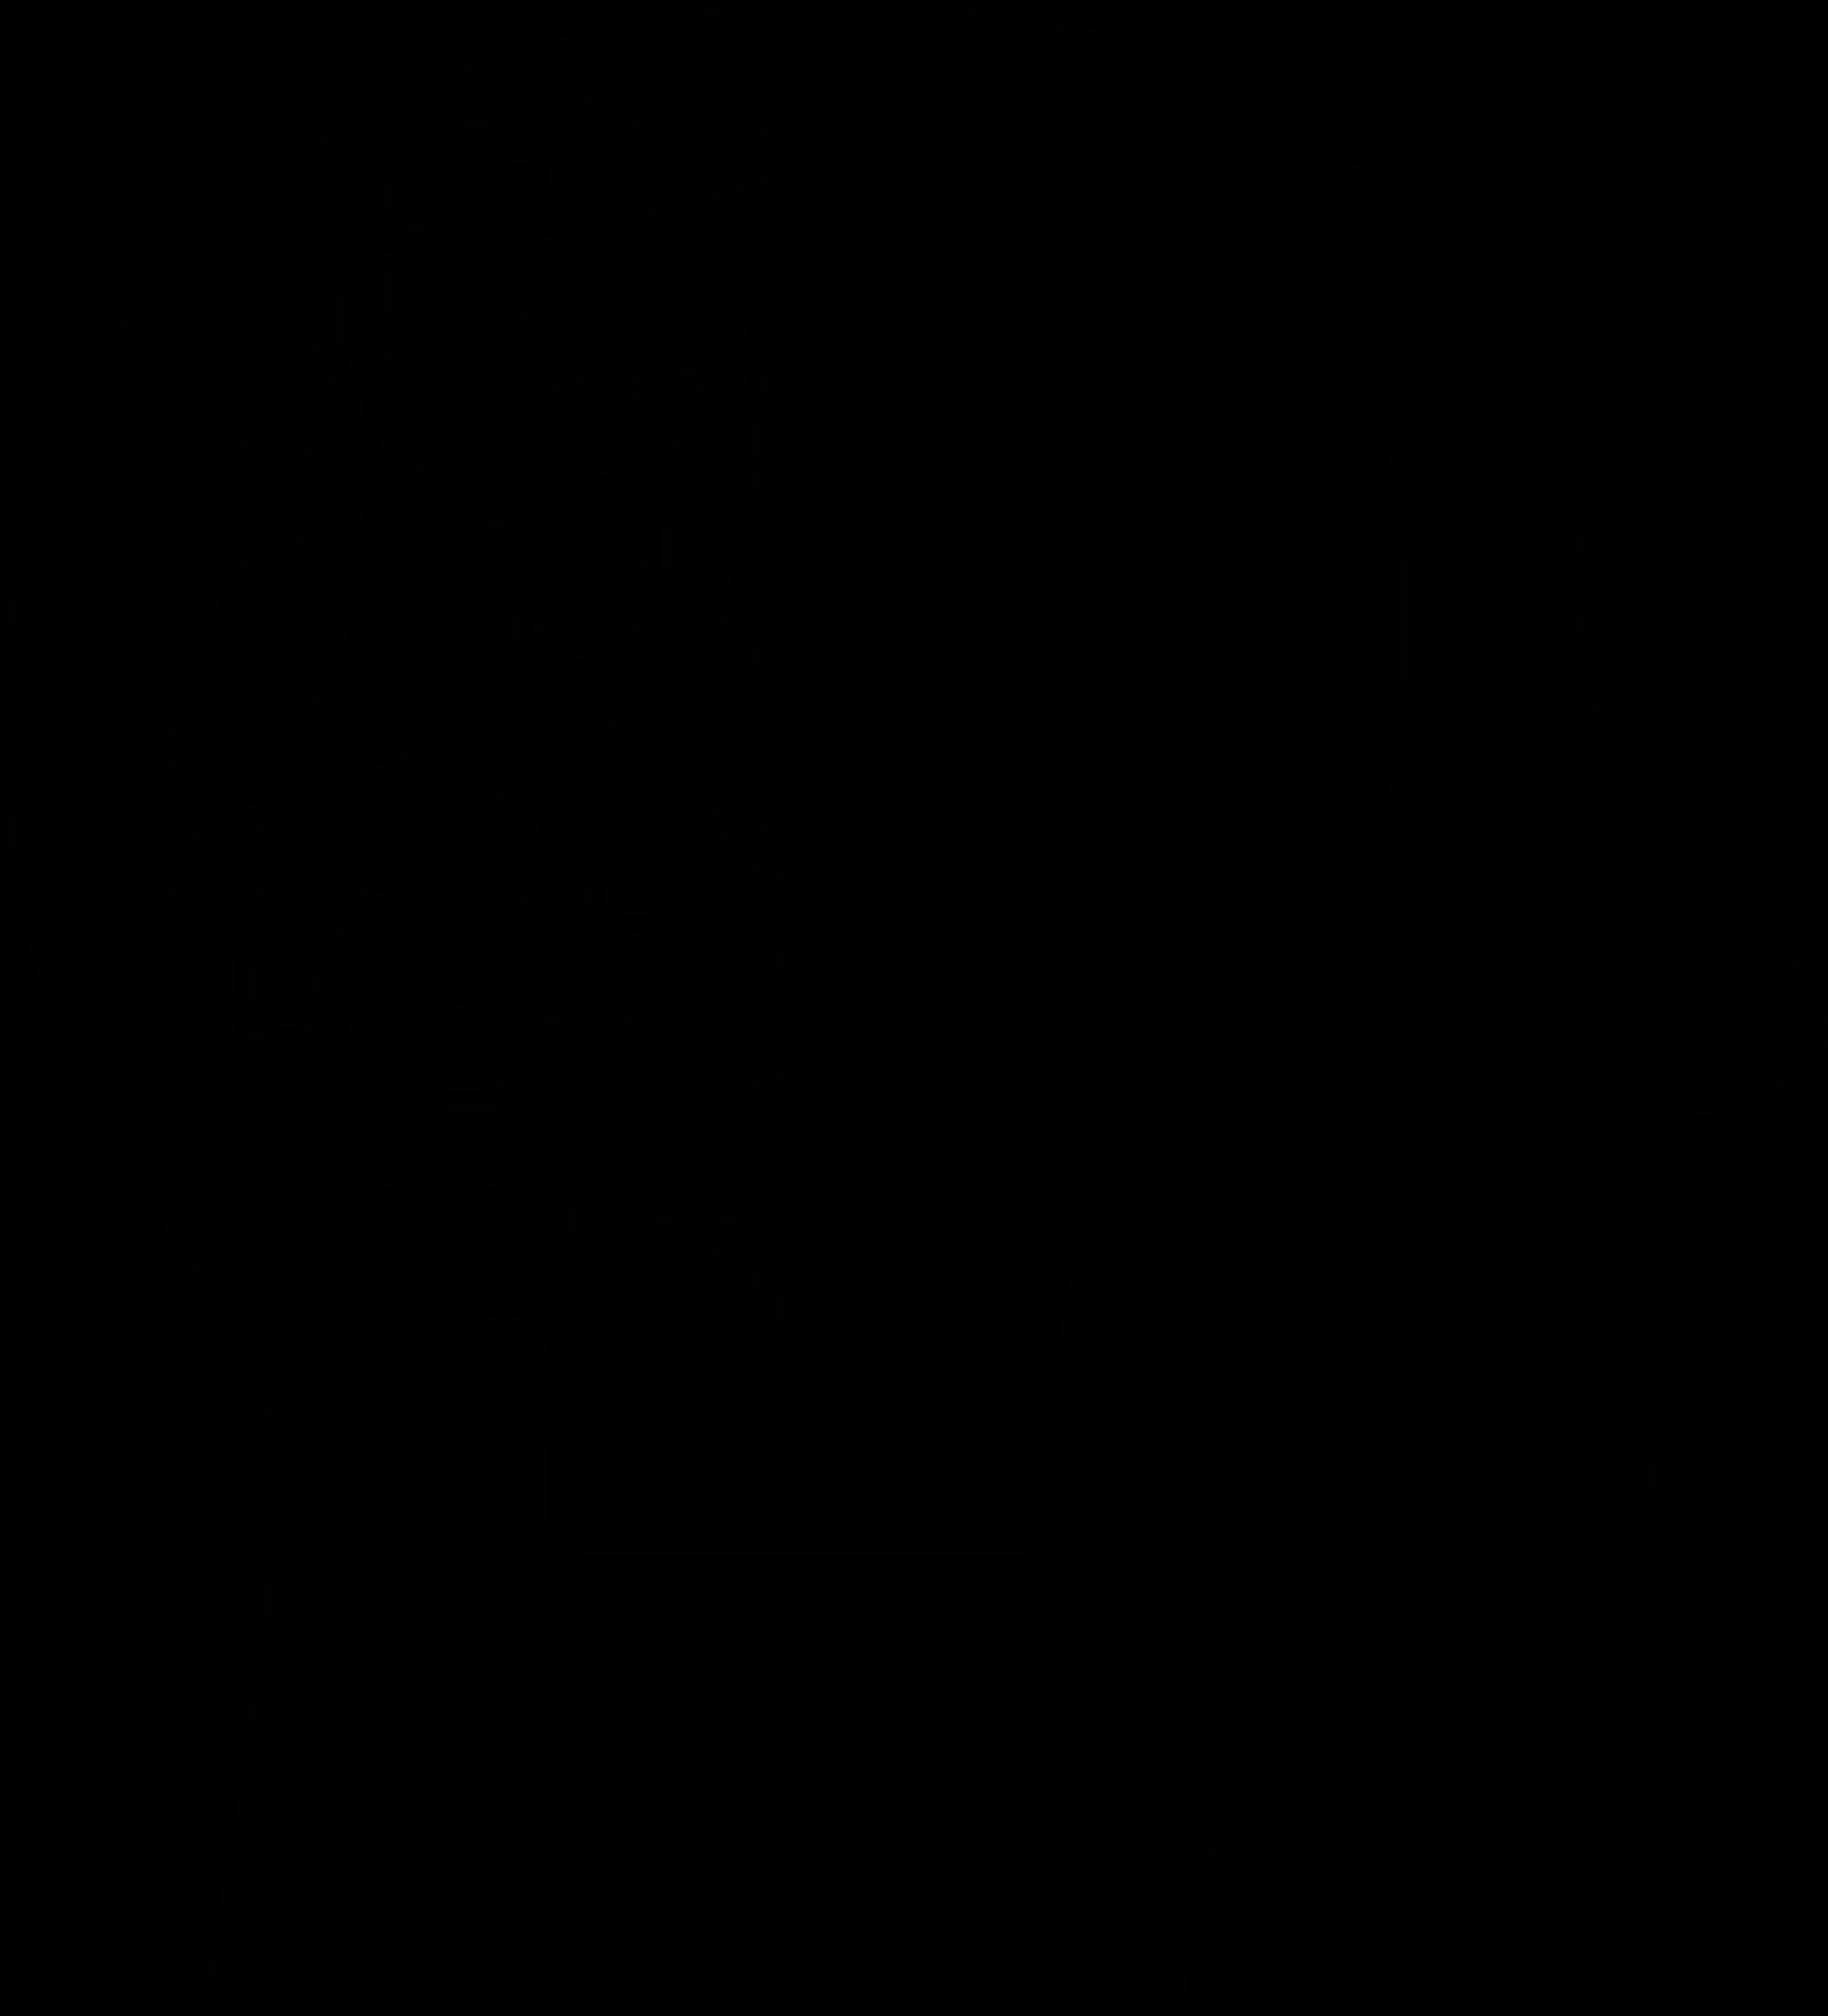 Clipart Man Light Bulb Brain - Brain PNG